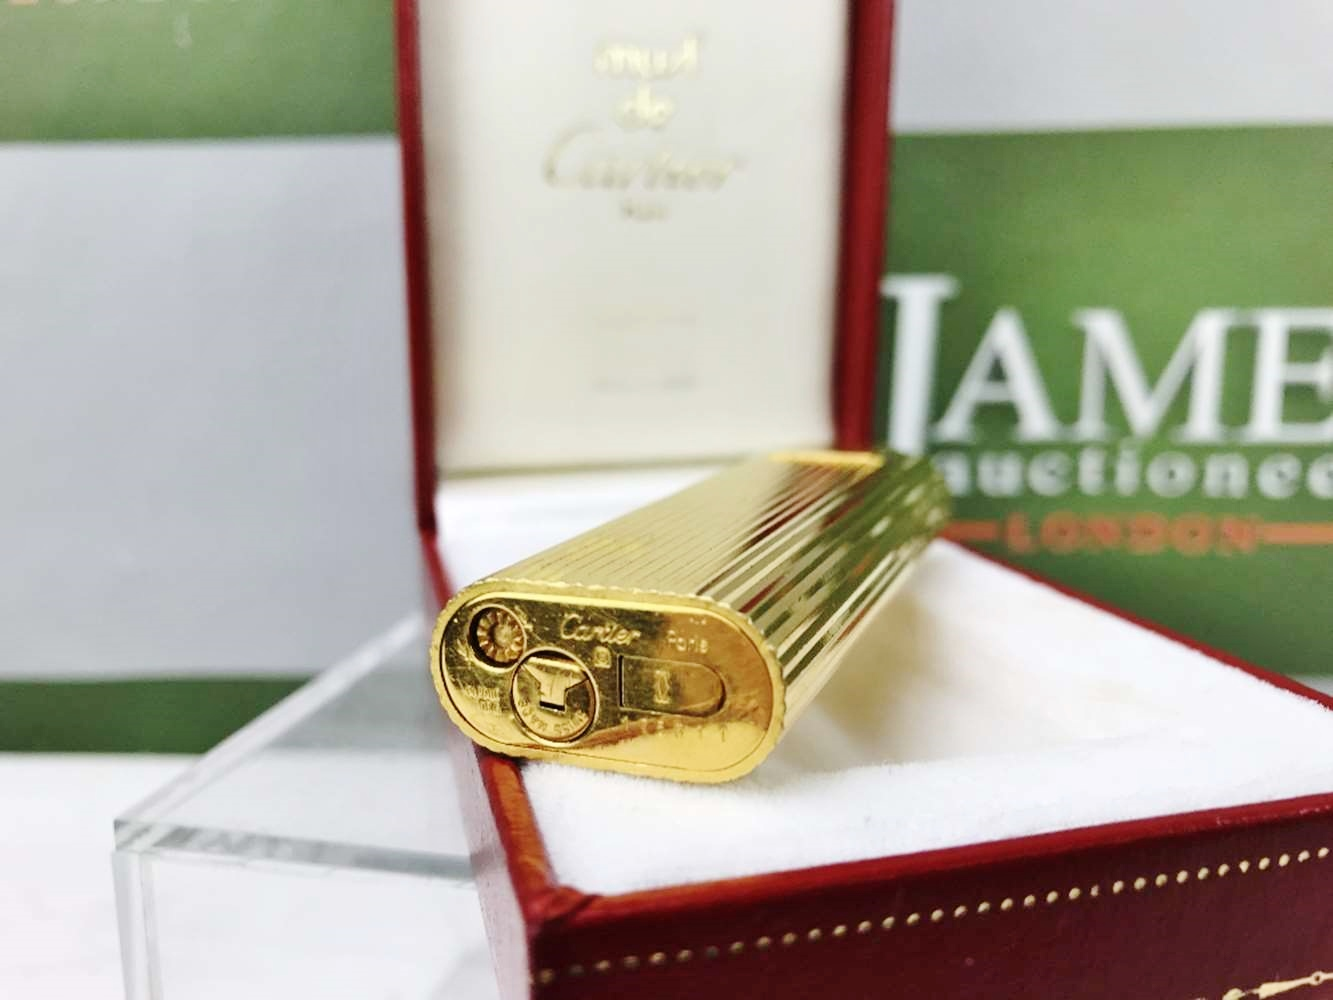 Lot 2 - Cartier 18 Carat Gold Plated Working Lighter With Original Box